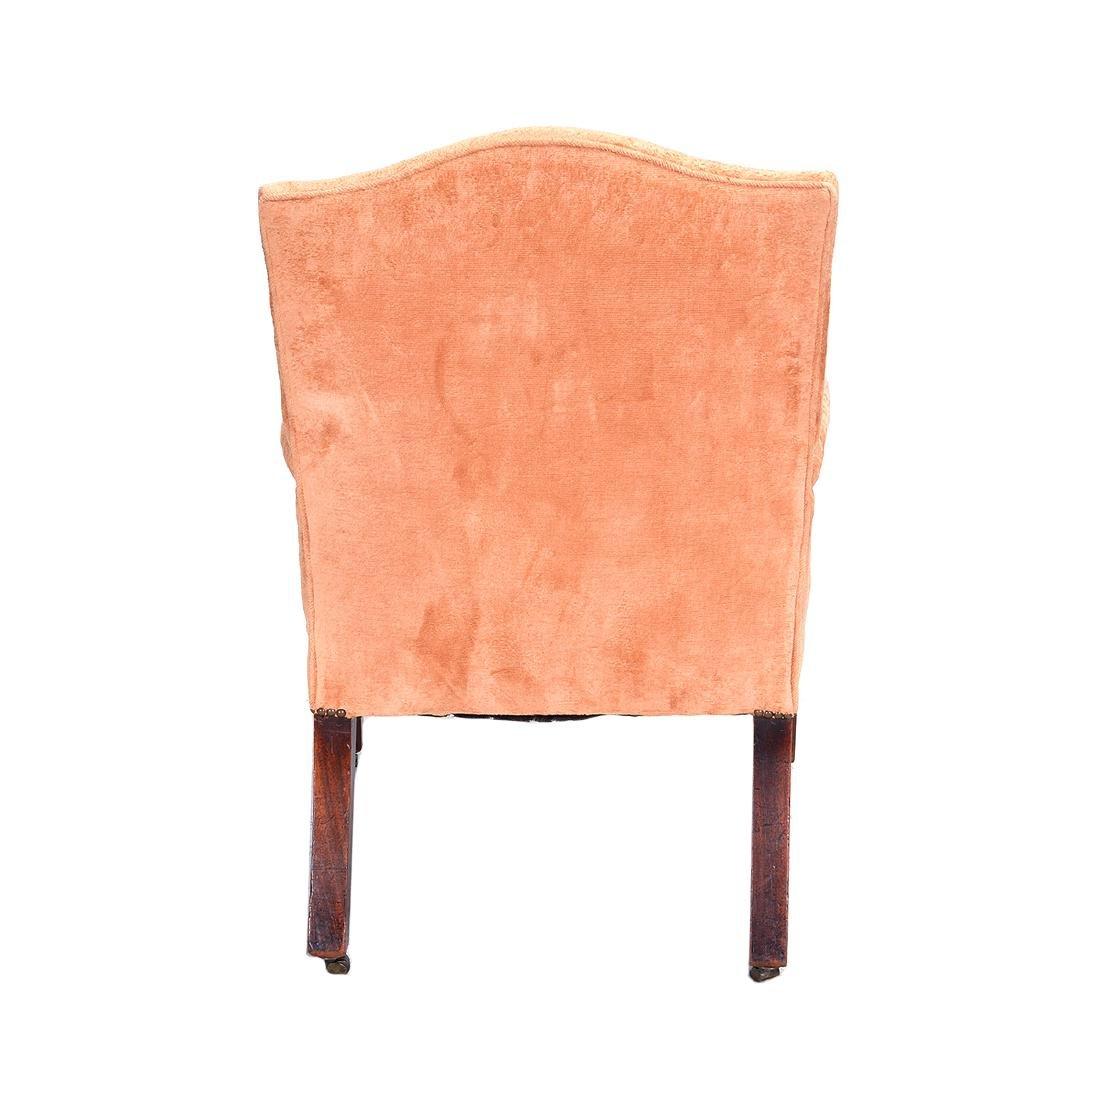 George III Mahogany Upholstered Open Armchair - 6